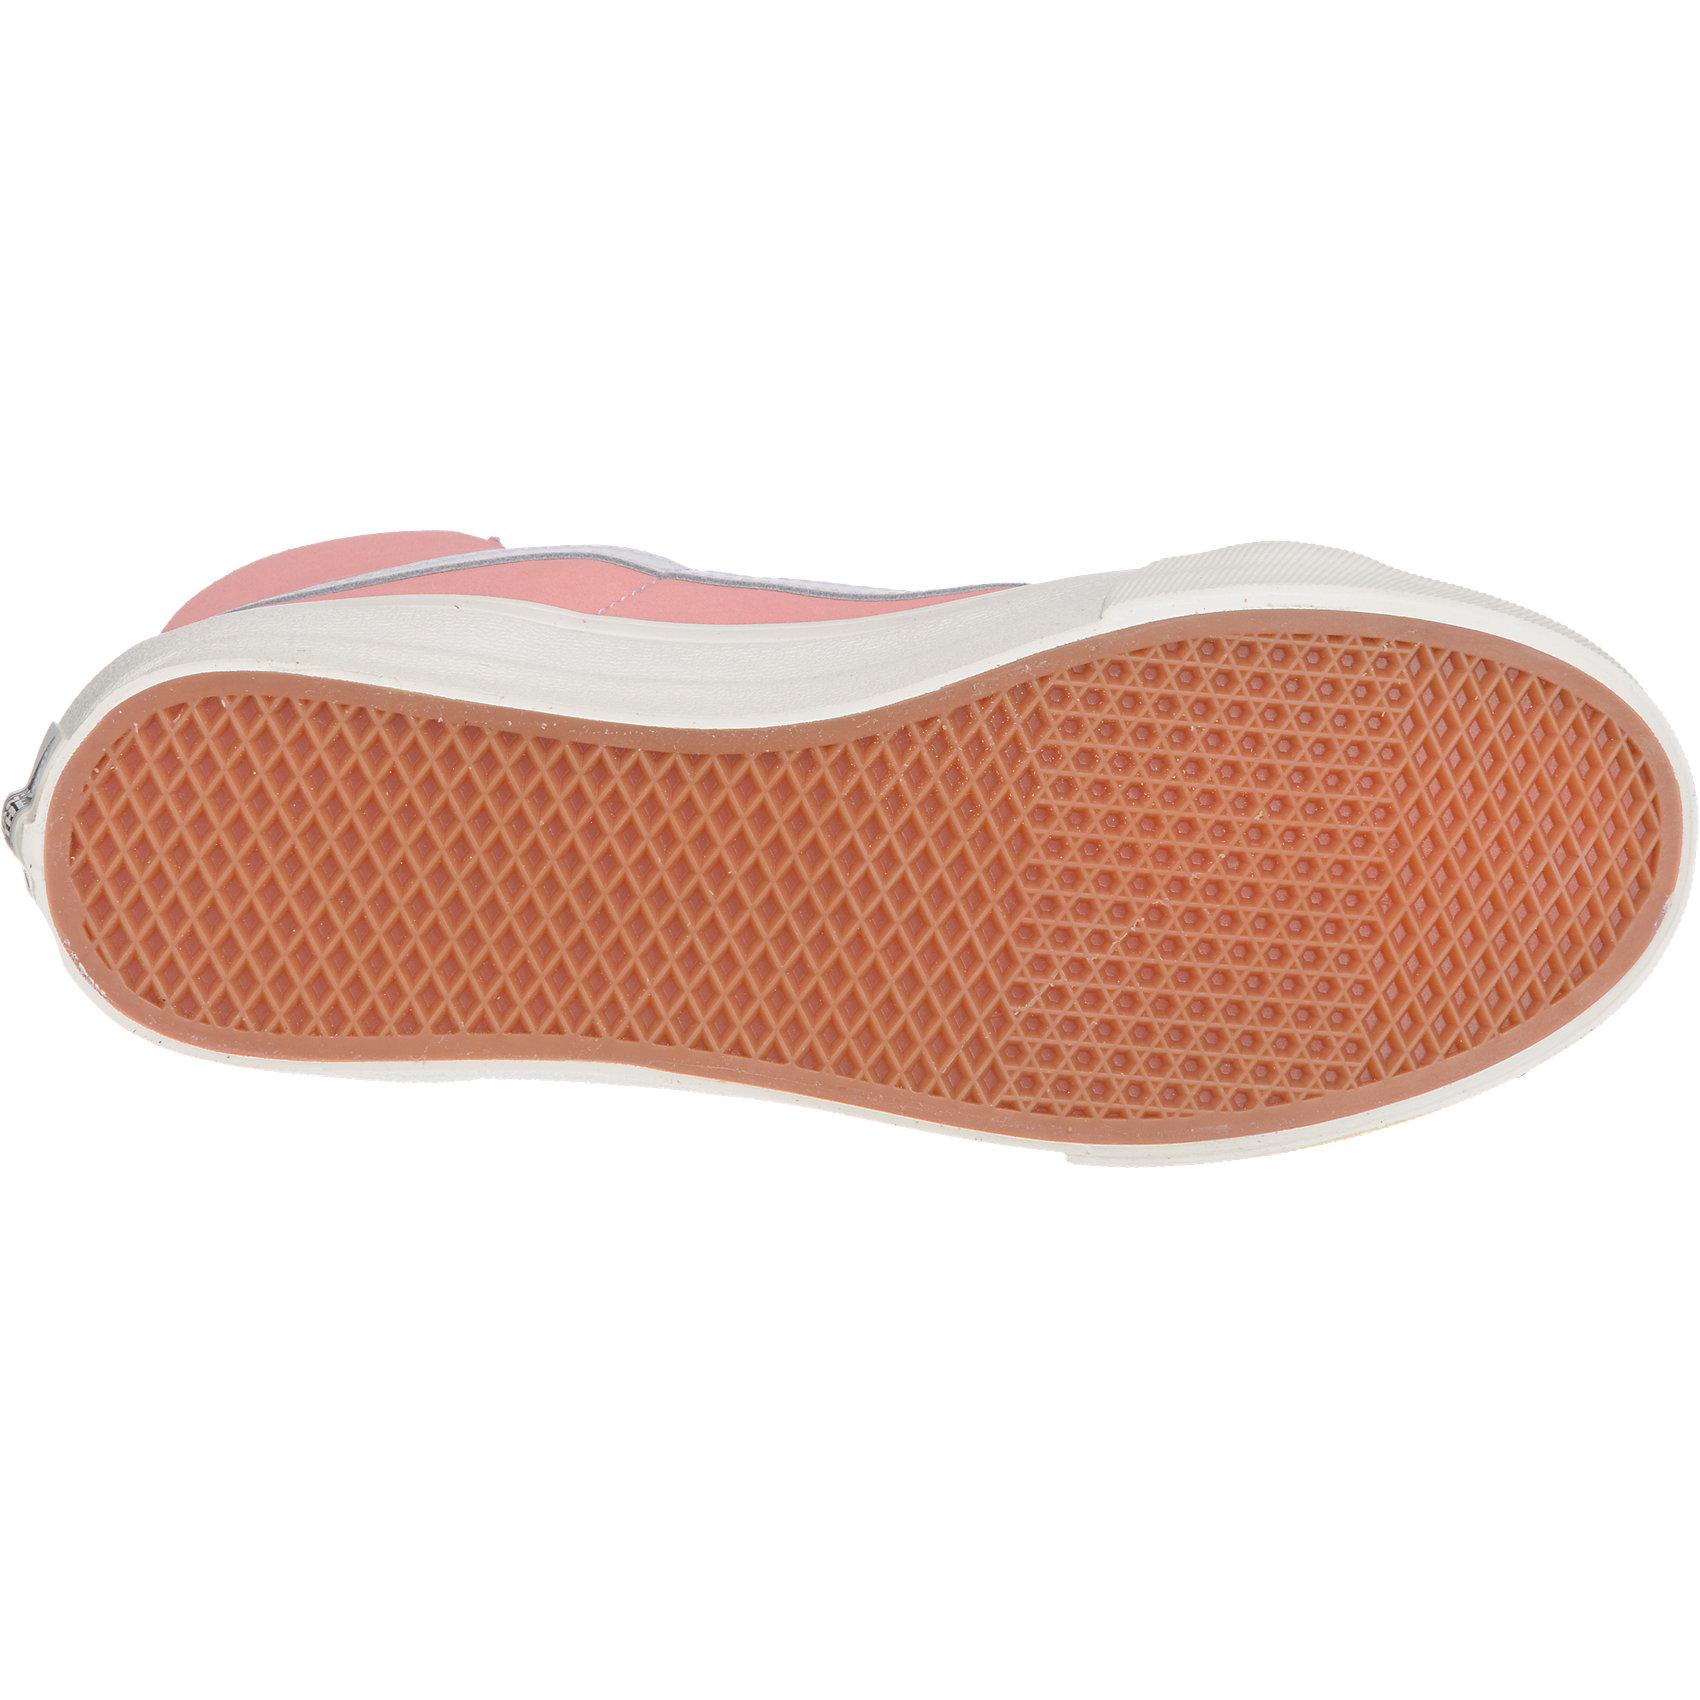 Vans 5774206 Sk8 hi Rosa Neu Sneakers bf76Yvgy